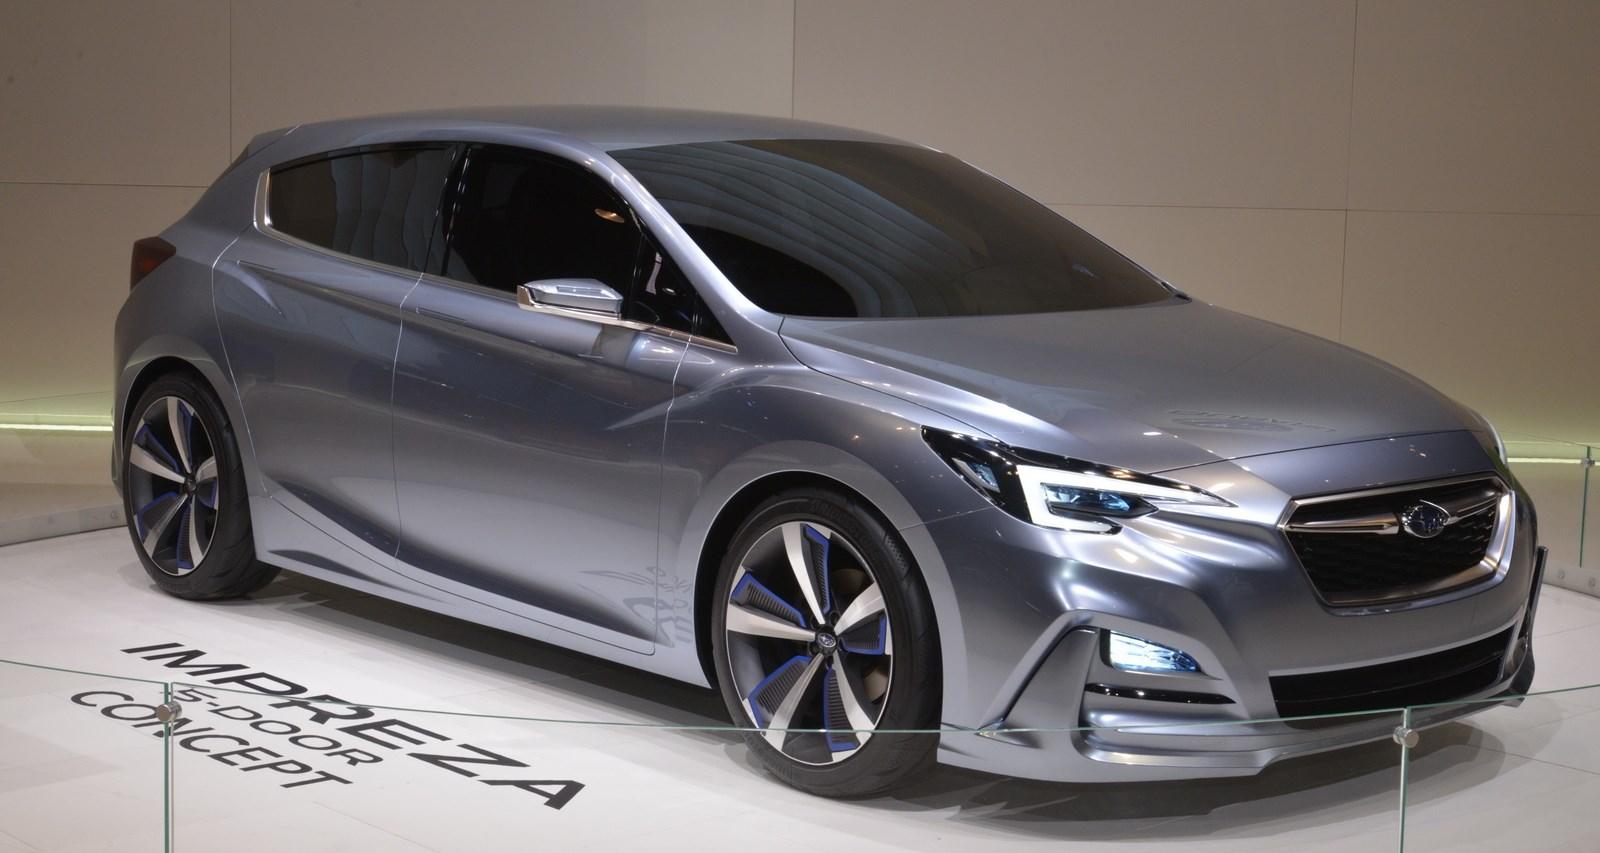 subaru impreza new york at auto show 2017 2018 best cars reviews 2017 2018 best cars reviews. Black Bedroom Furniture Sets. Home Design Ideas